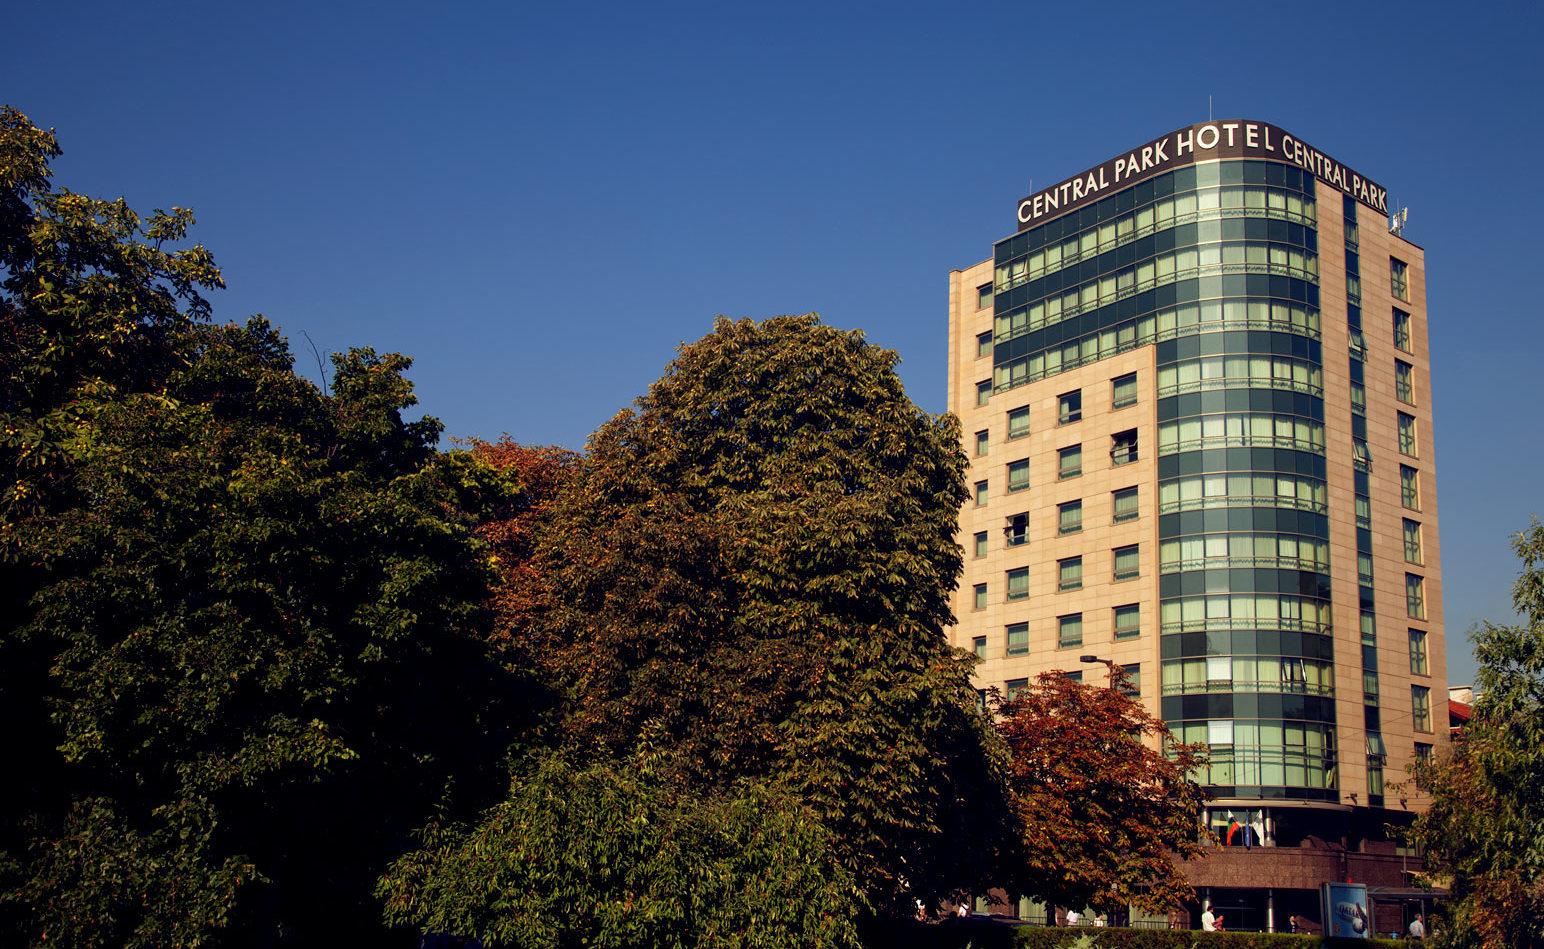 حجز فندق سنترال صوفيا